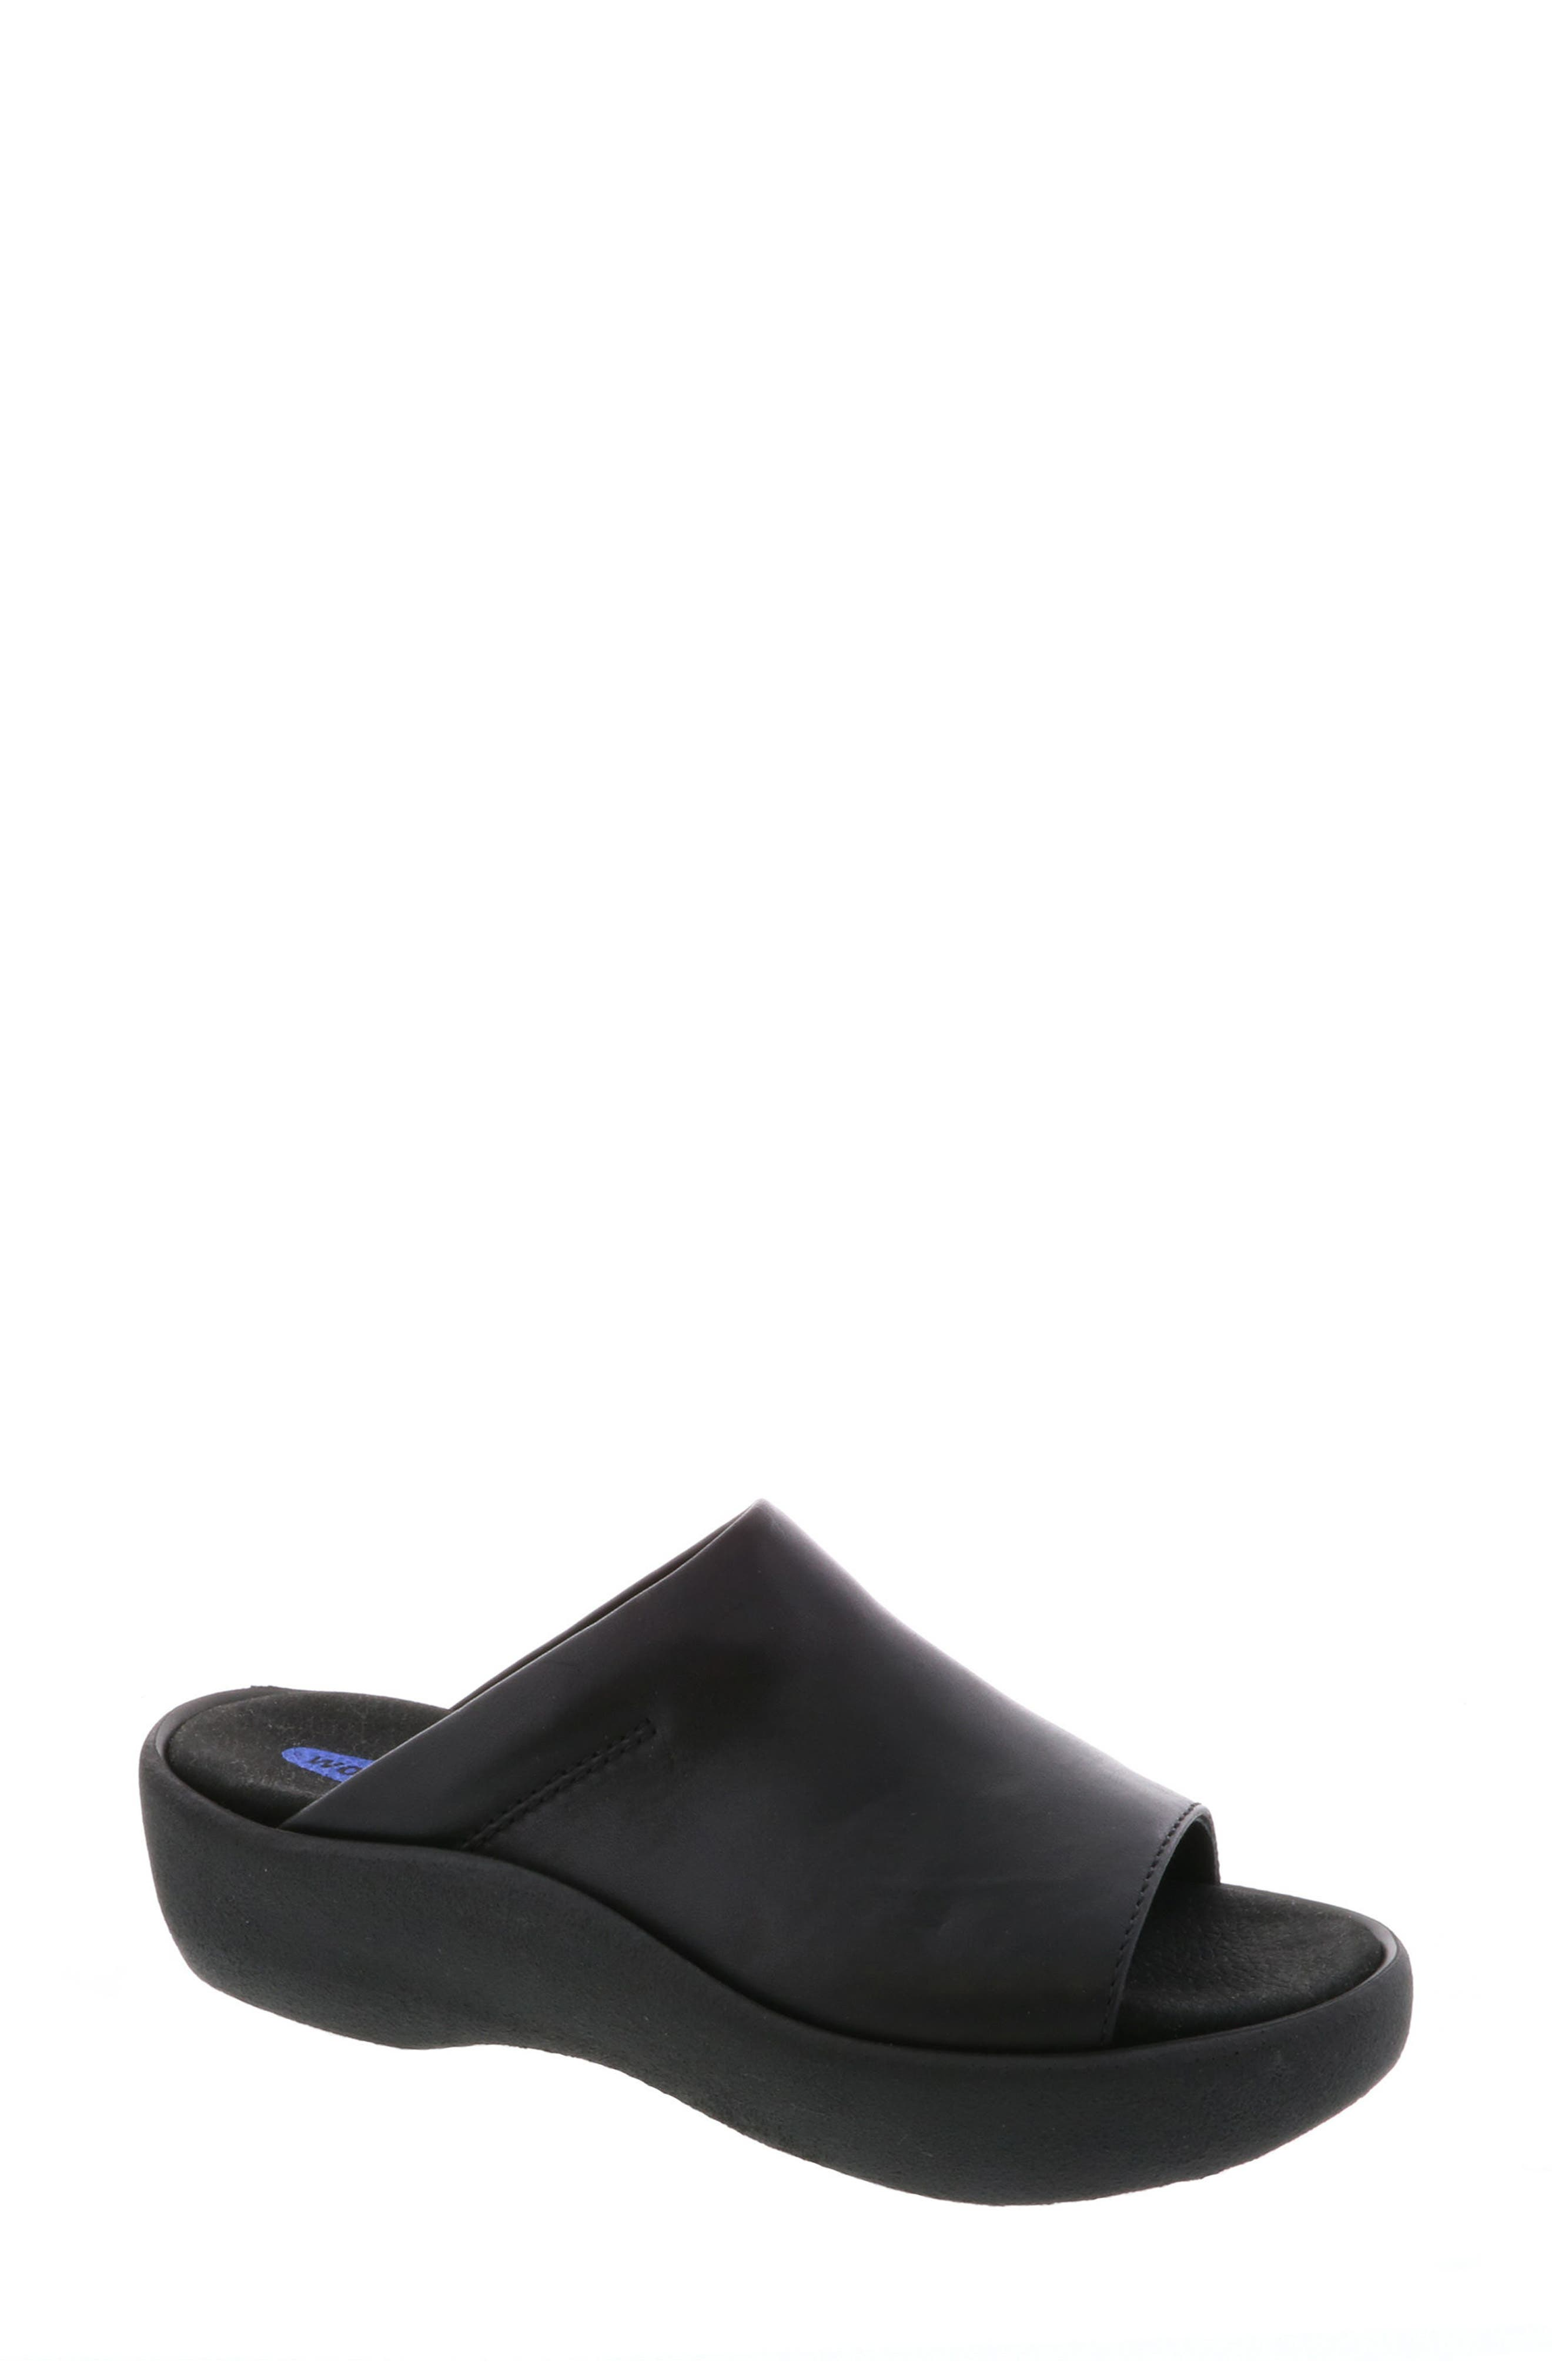 Nassau Slide Sandal,                             Main thumbnail 1, color,                             BLACK SMOOTH LEATHER